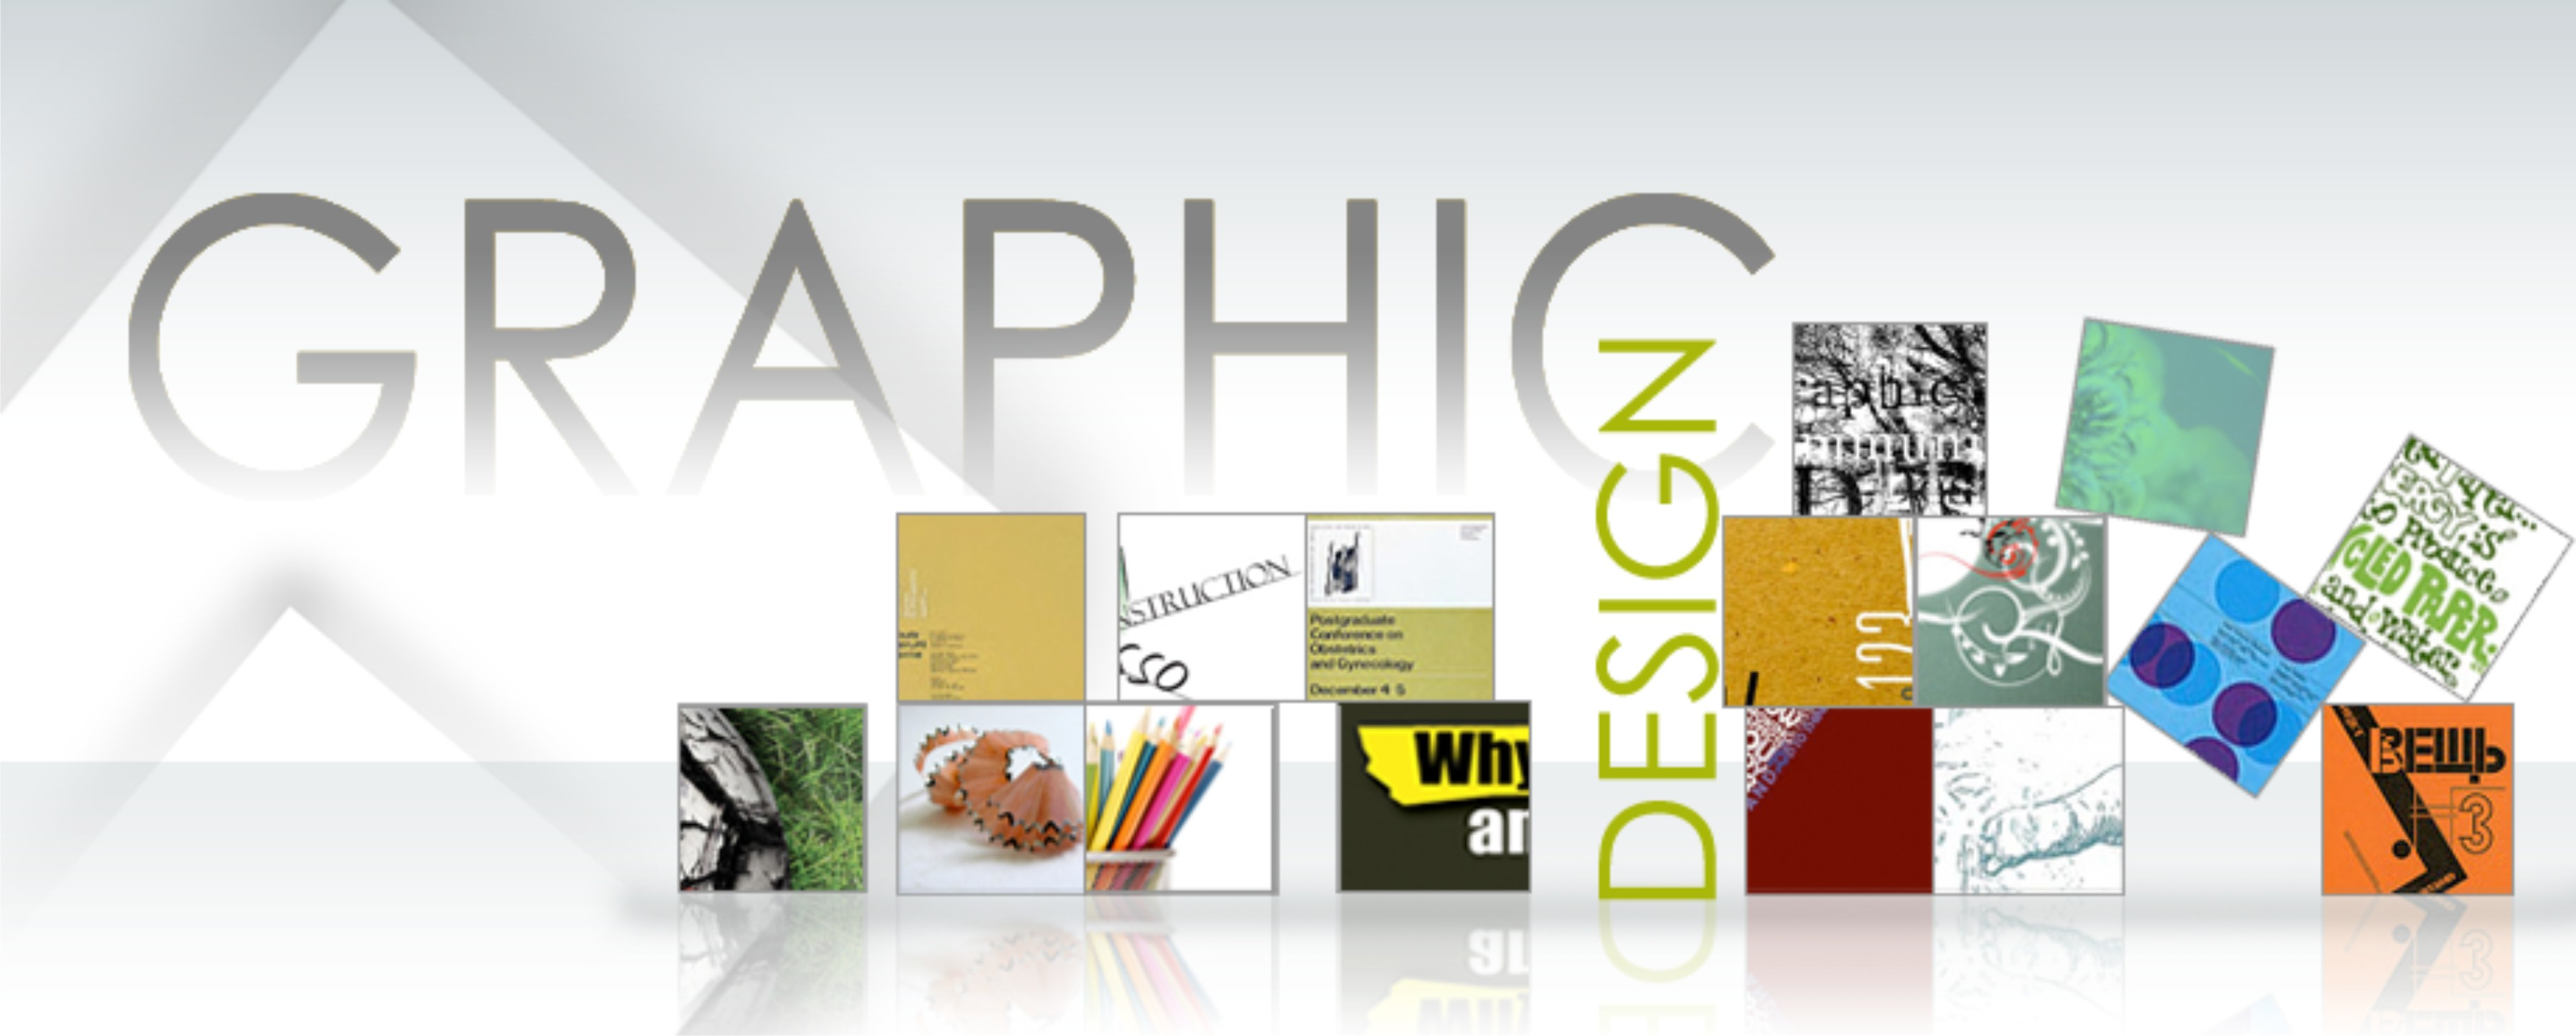 Graphic Design Solutions In Narela Weblancexperts Informatics